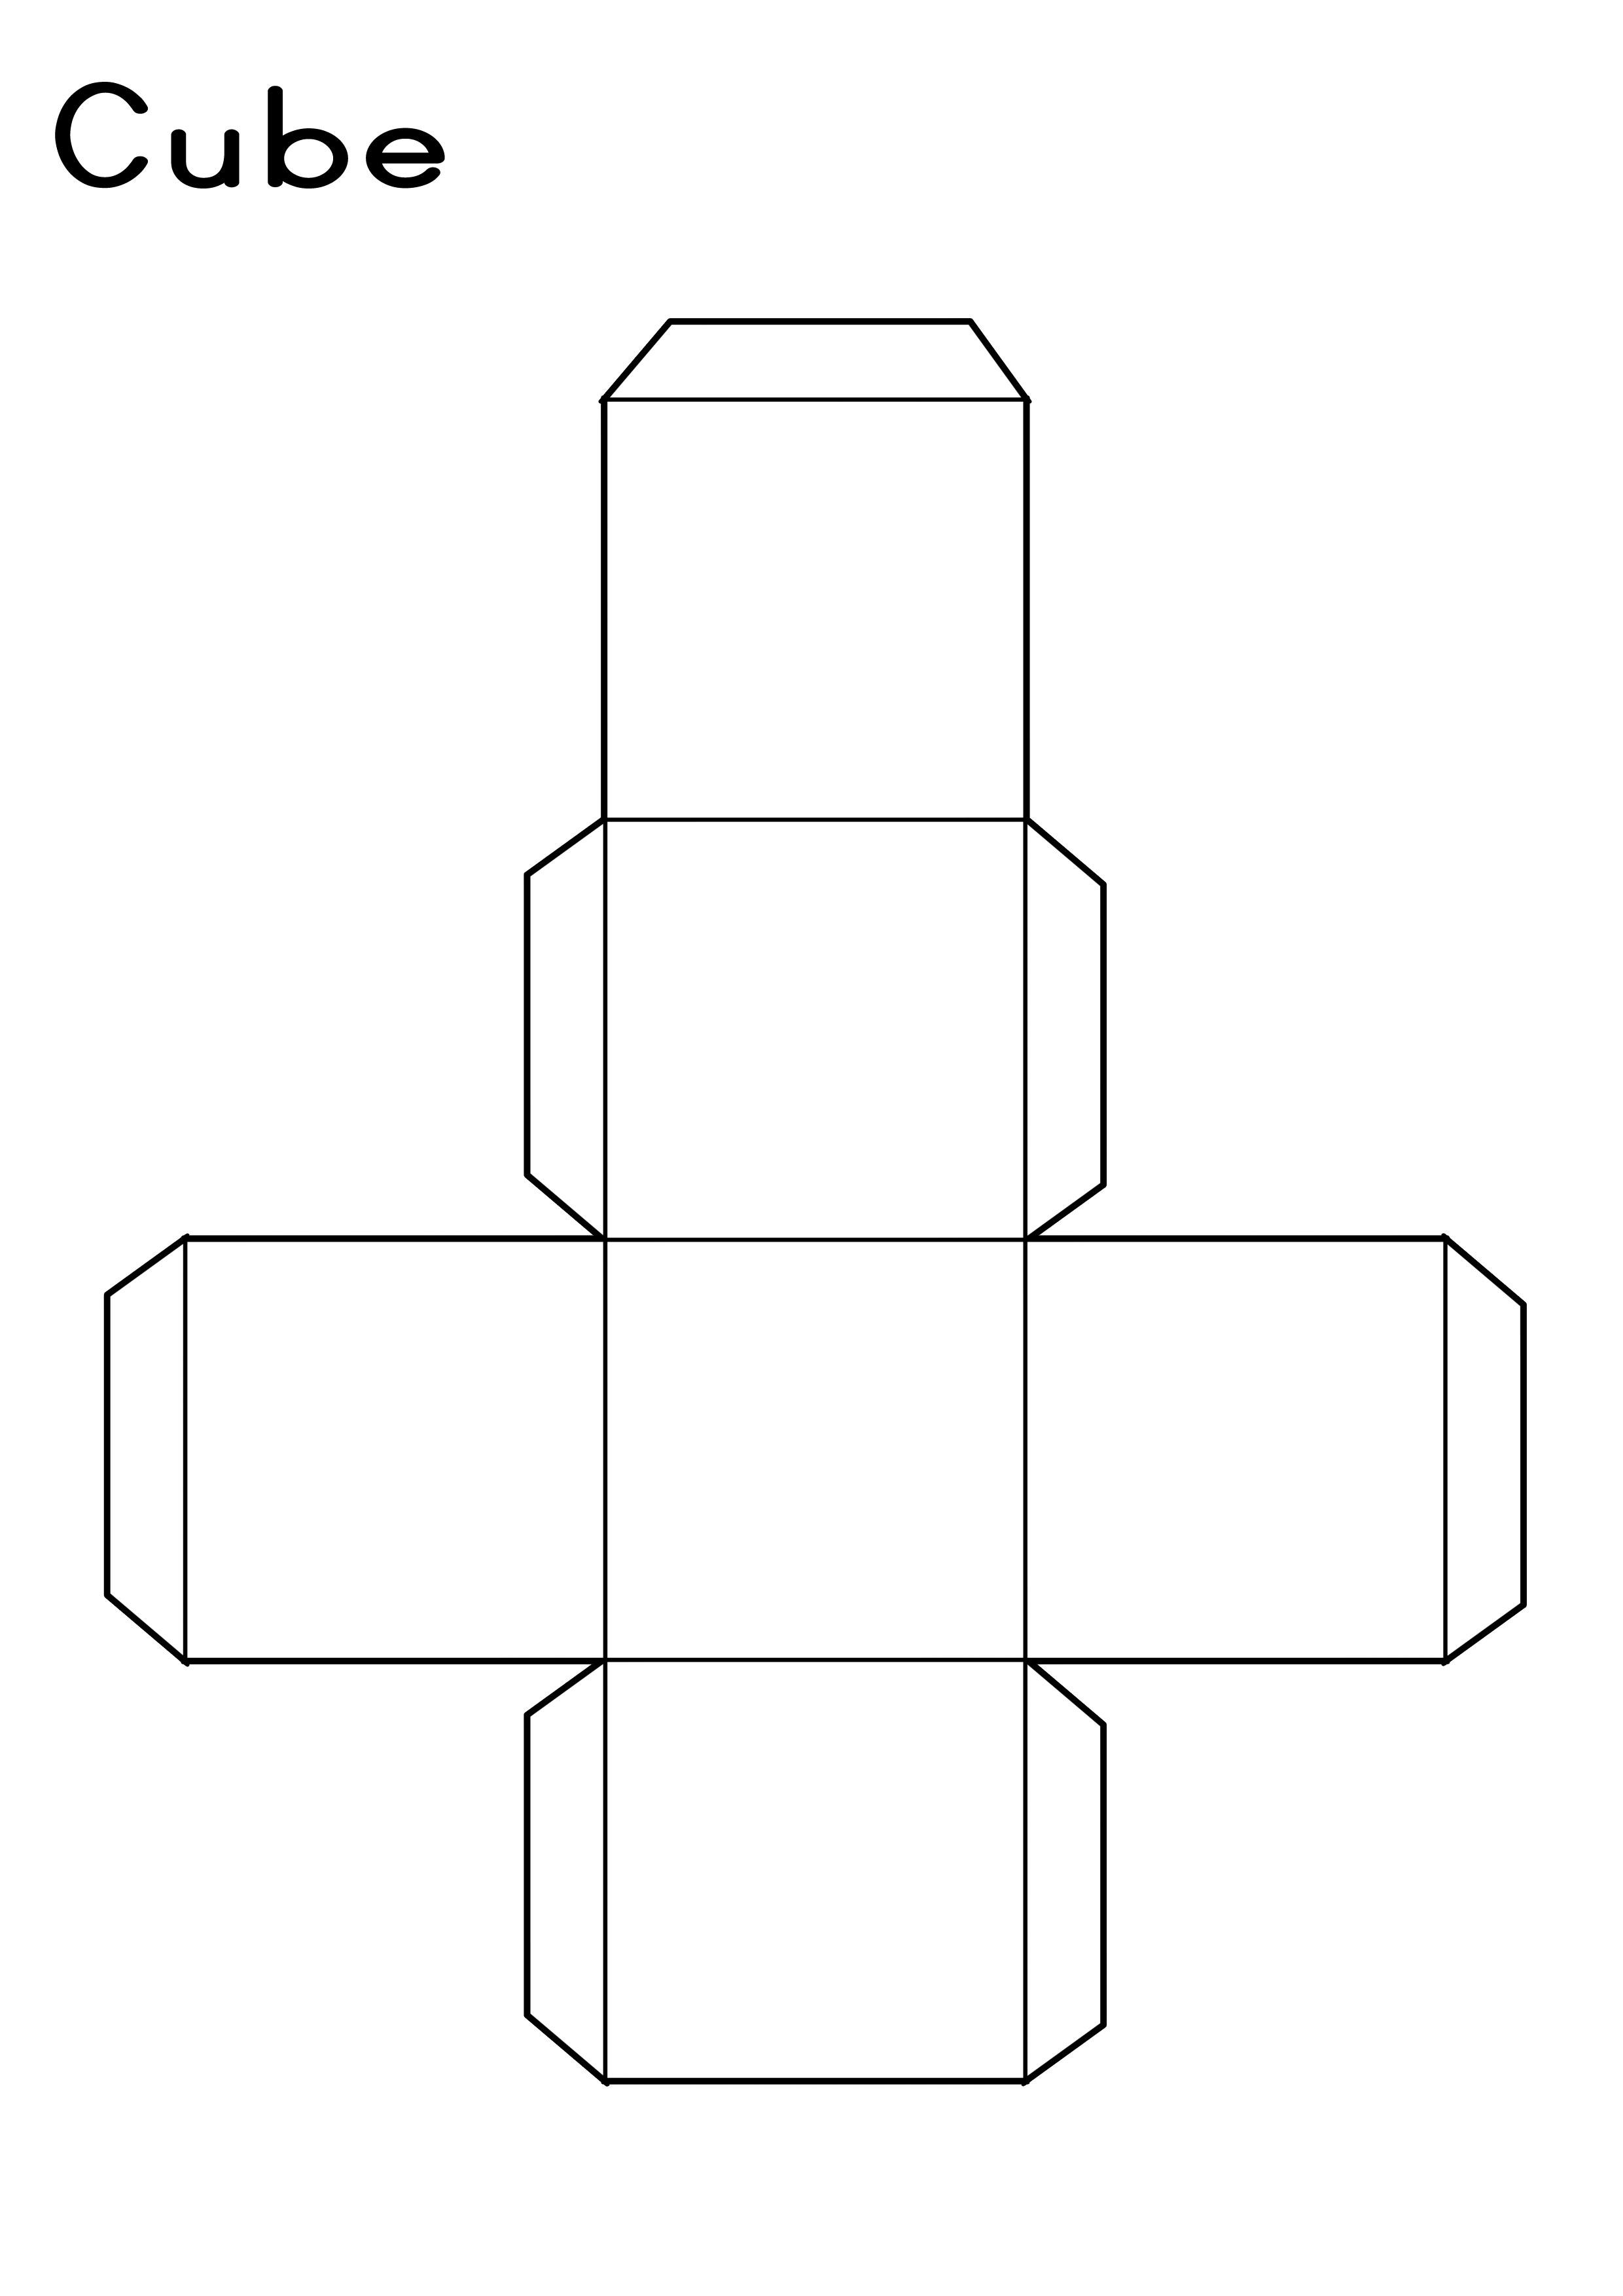 Cube Printable